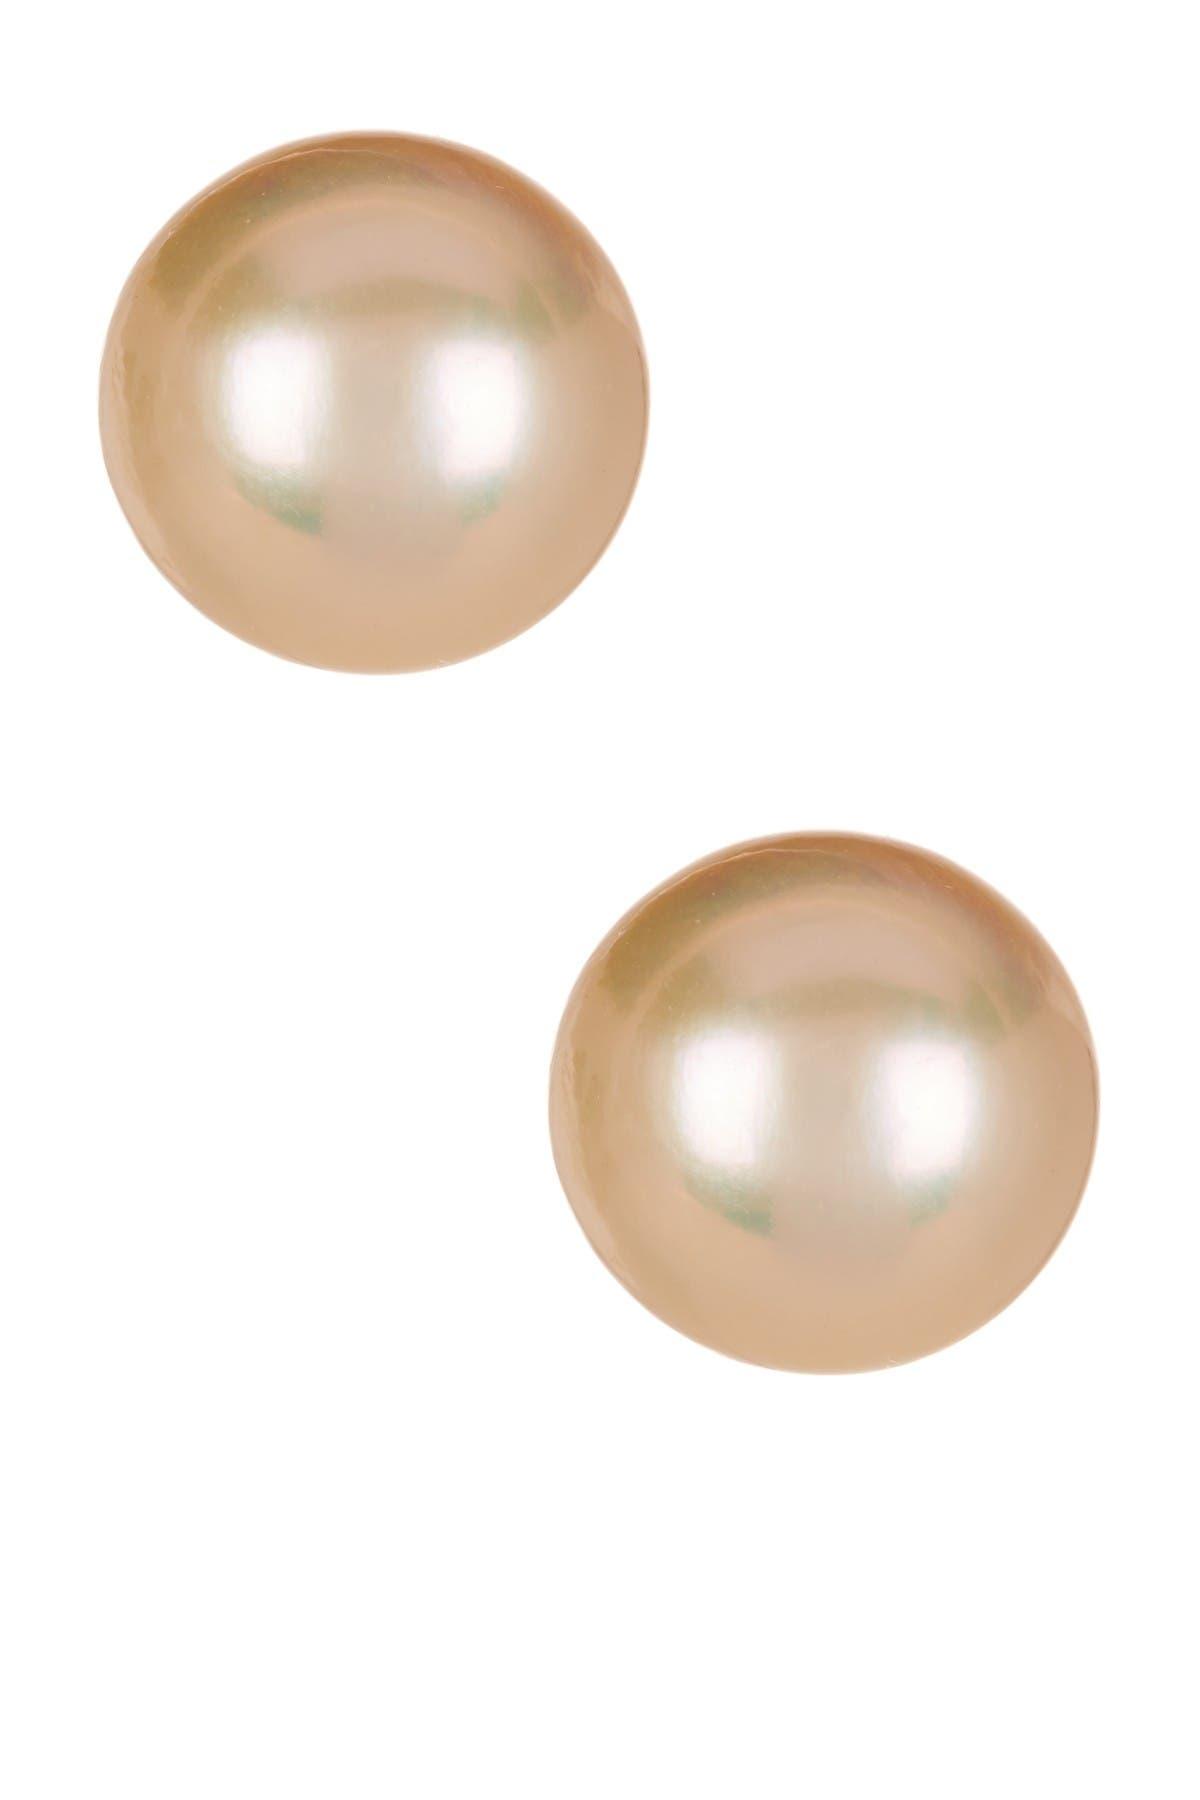 Splendid Pearls 14K Yellow Gold 10-10.5mm Pink Cultured Freshwater Pearl Stud Earrings at Nordstrom Rack